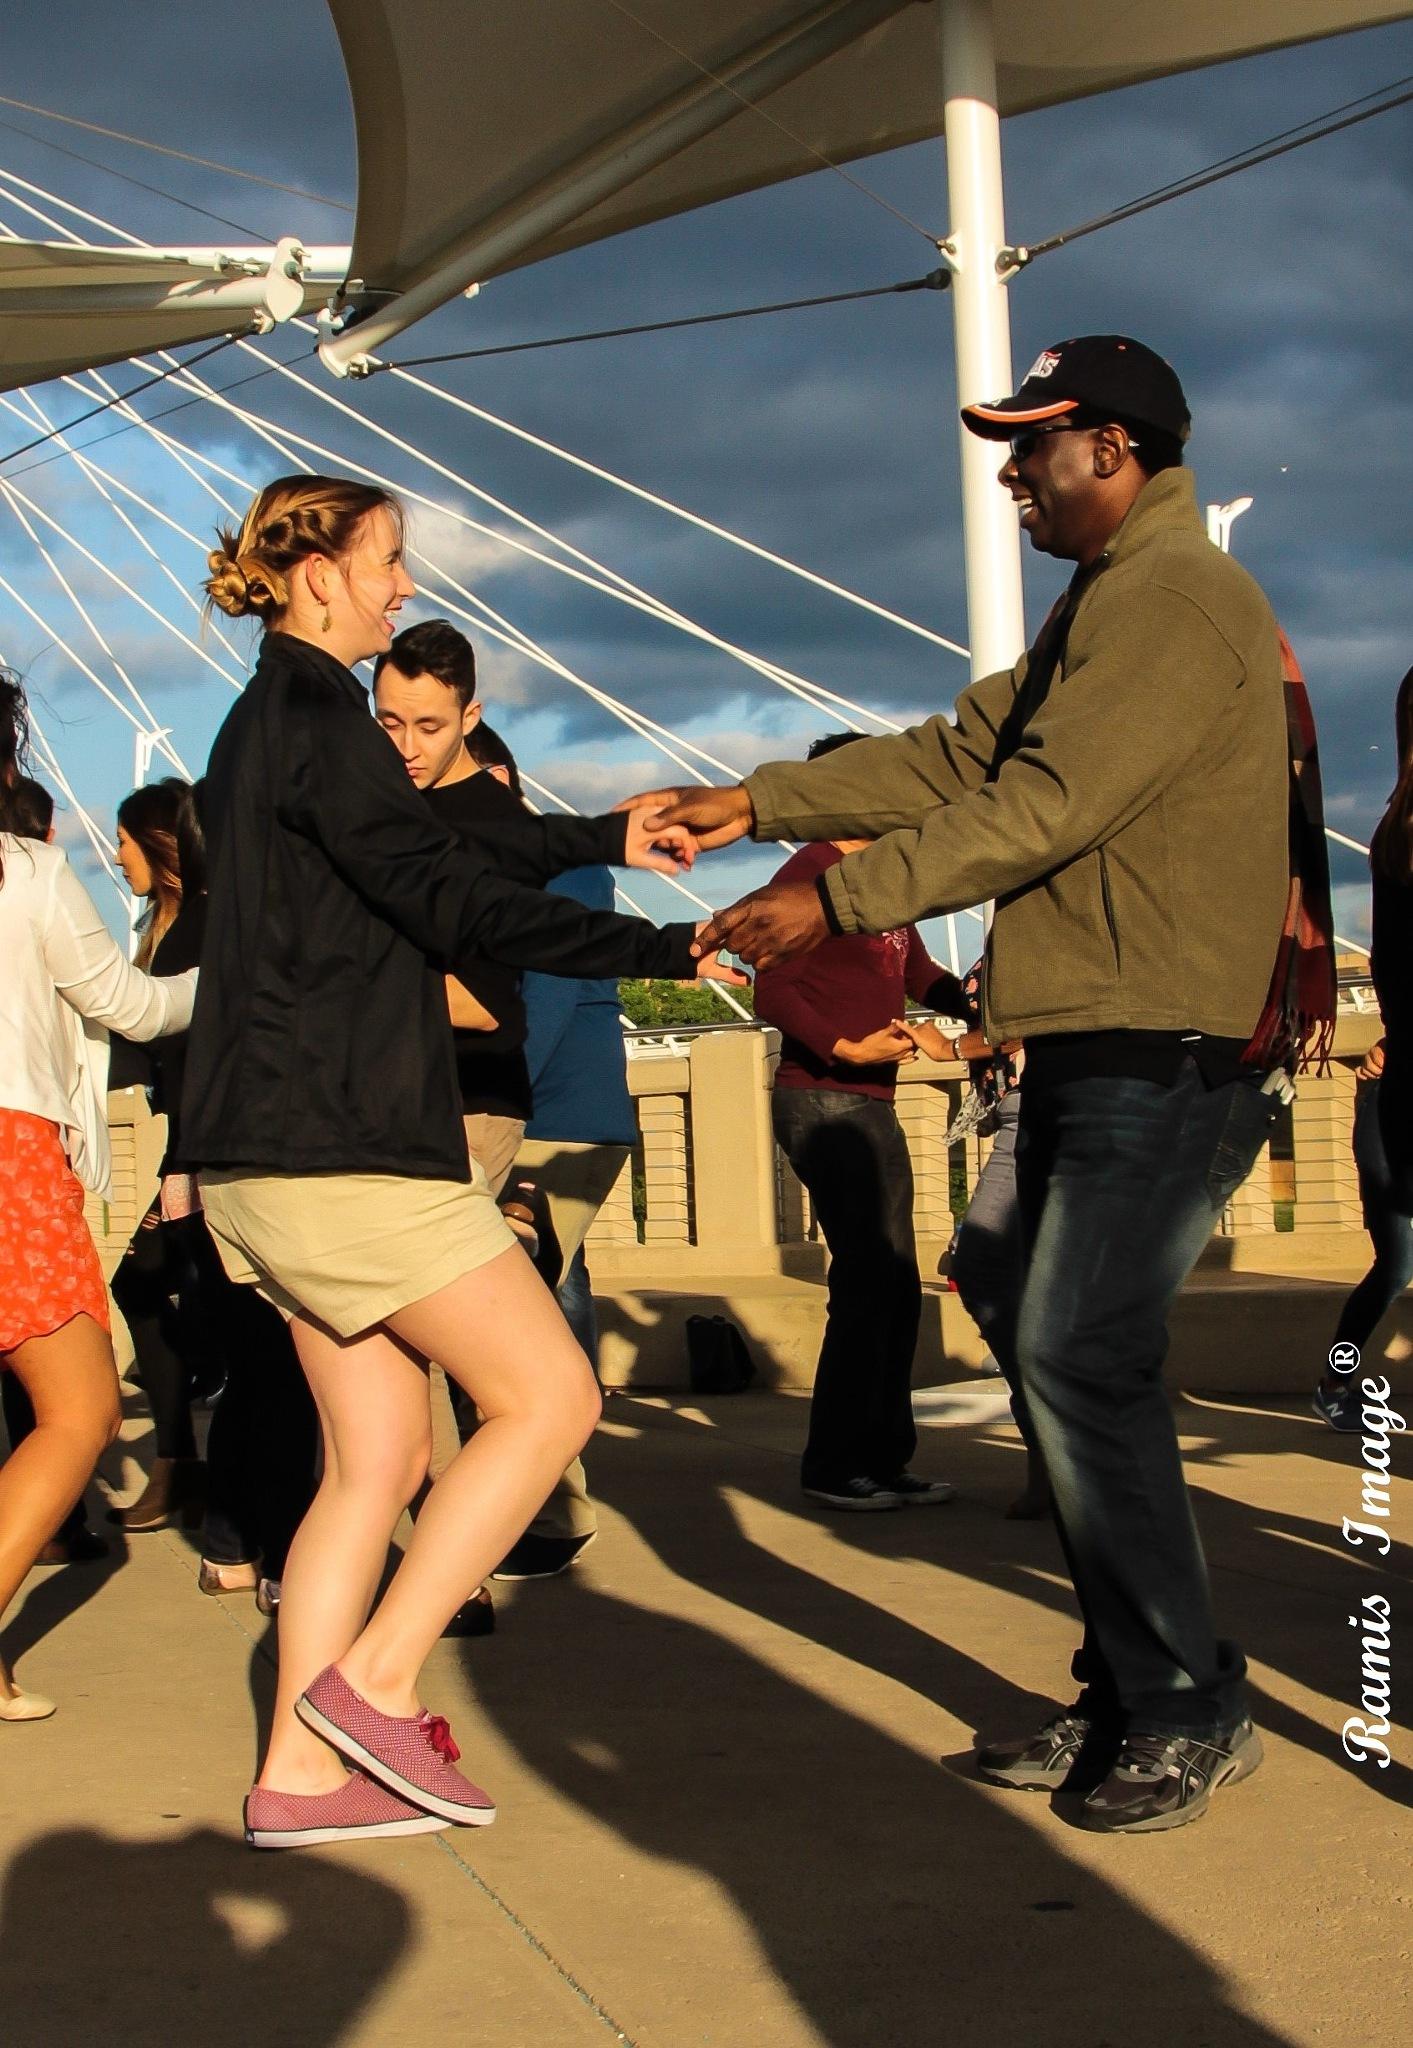 dancing at the bridge by yombino_Image